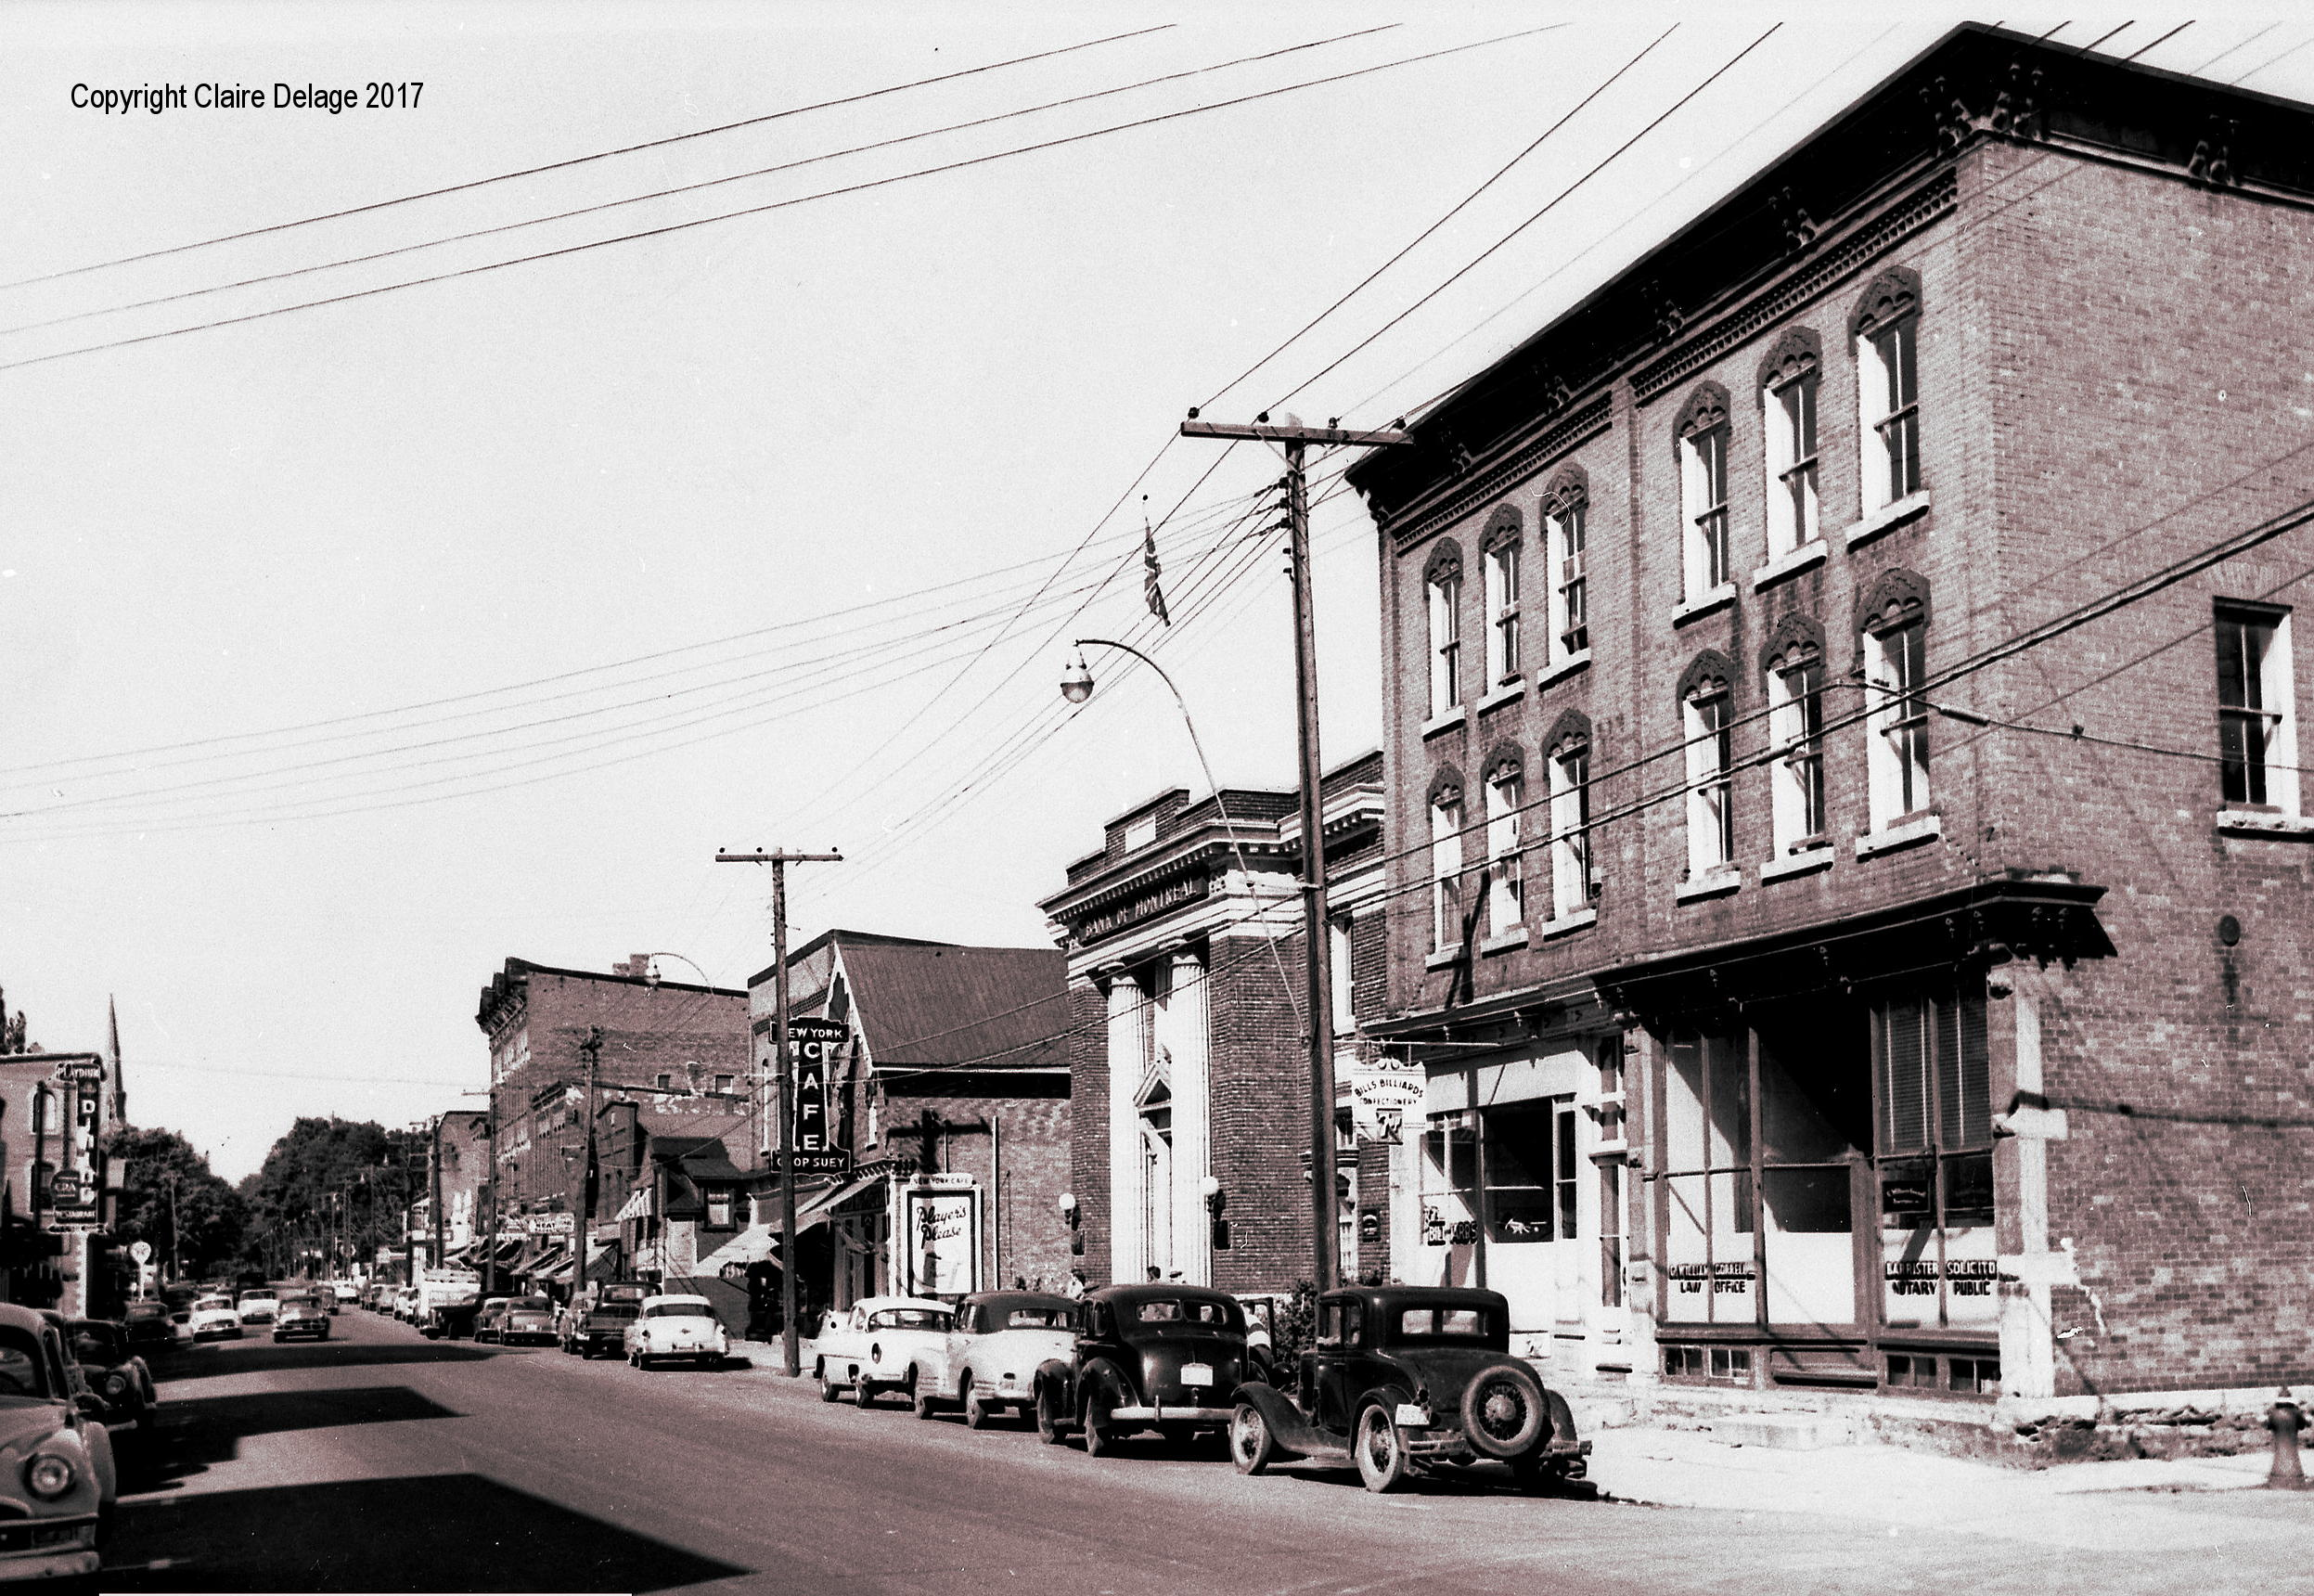 stlawrencepiks.com - Vitutual Tour of Historic Morrisburg